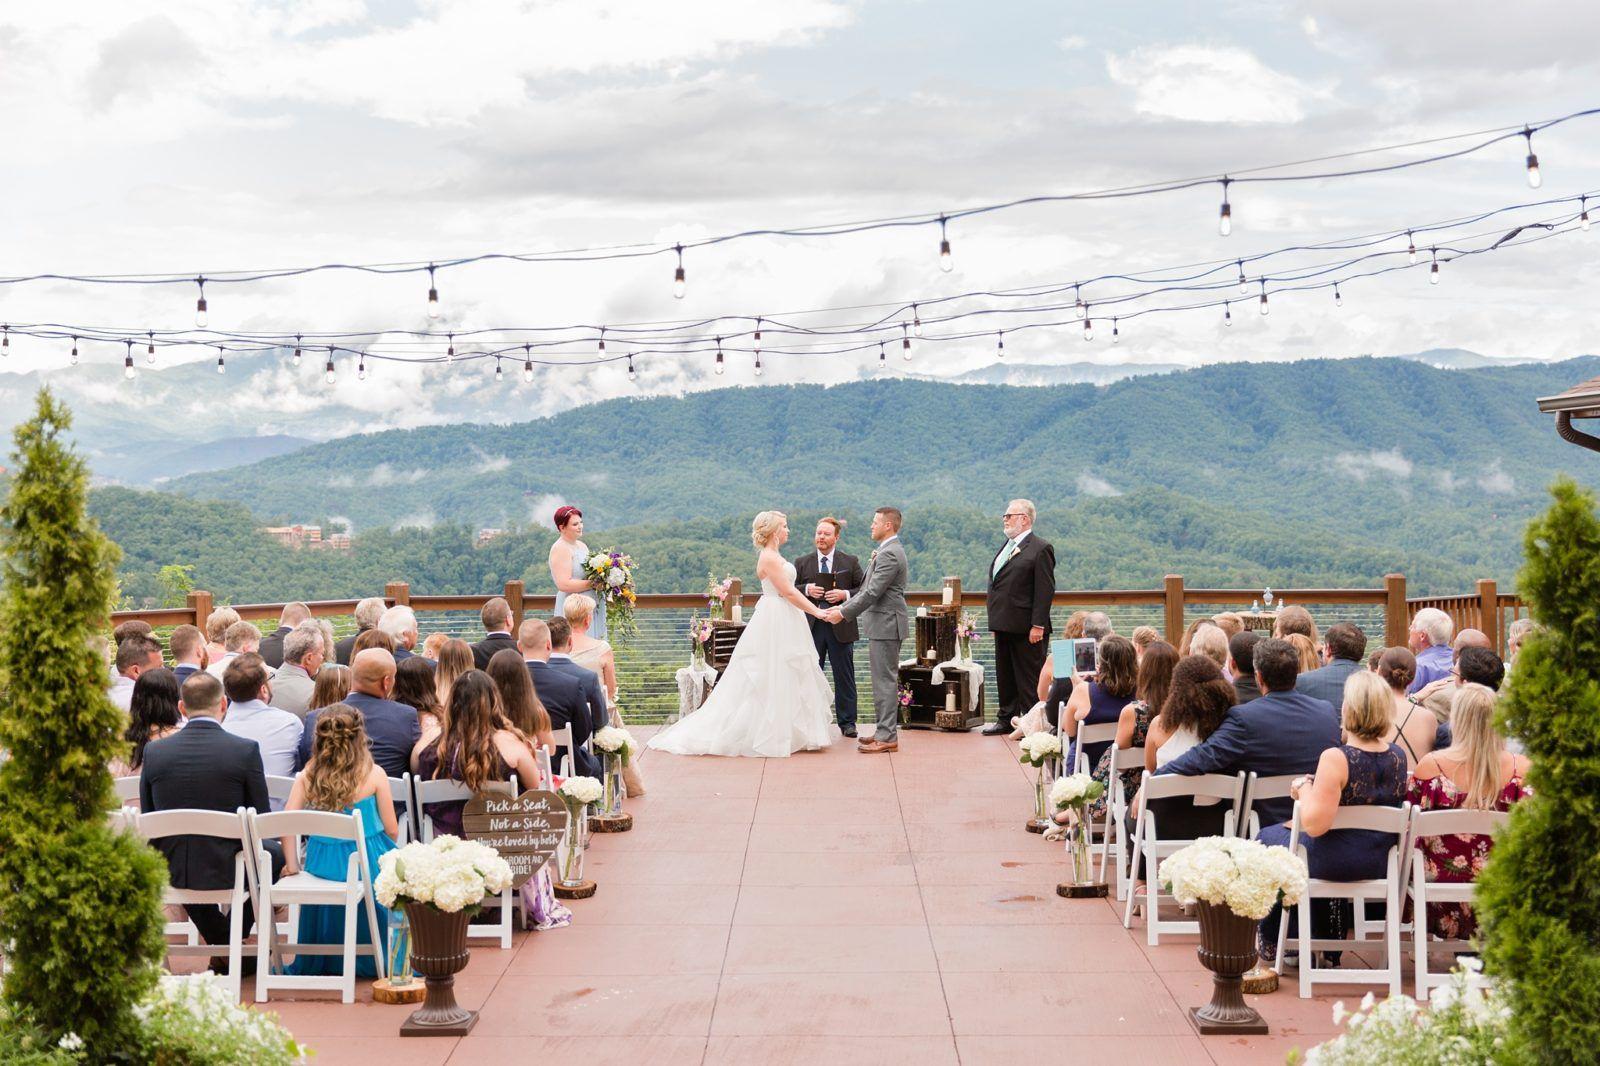 The Magnolia Pigeon Forge Wedding Smoky Mountain Wedding Mountain View Weddings Mountain Wedding